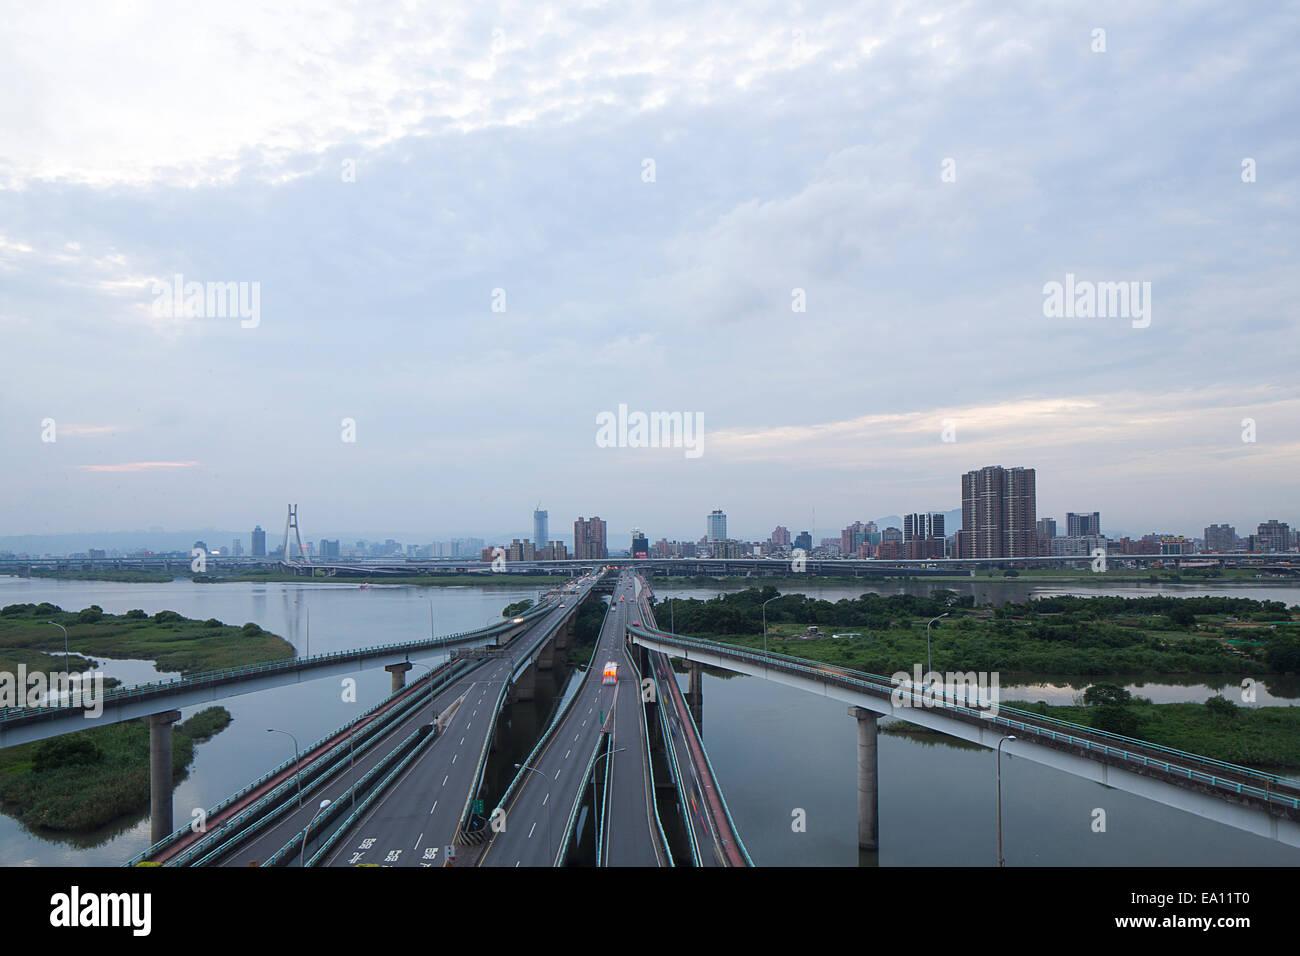 Des autoroutes et rivière, Taipei, Taiwan, Chine Photo Stock